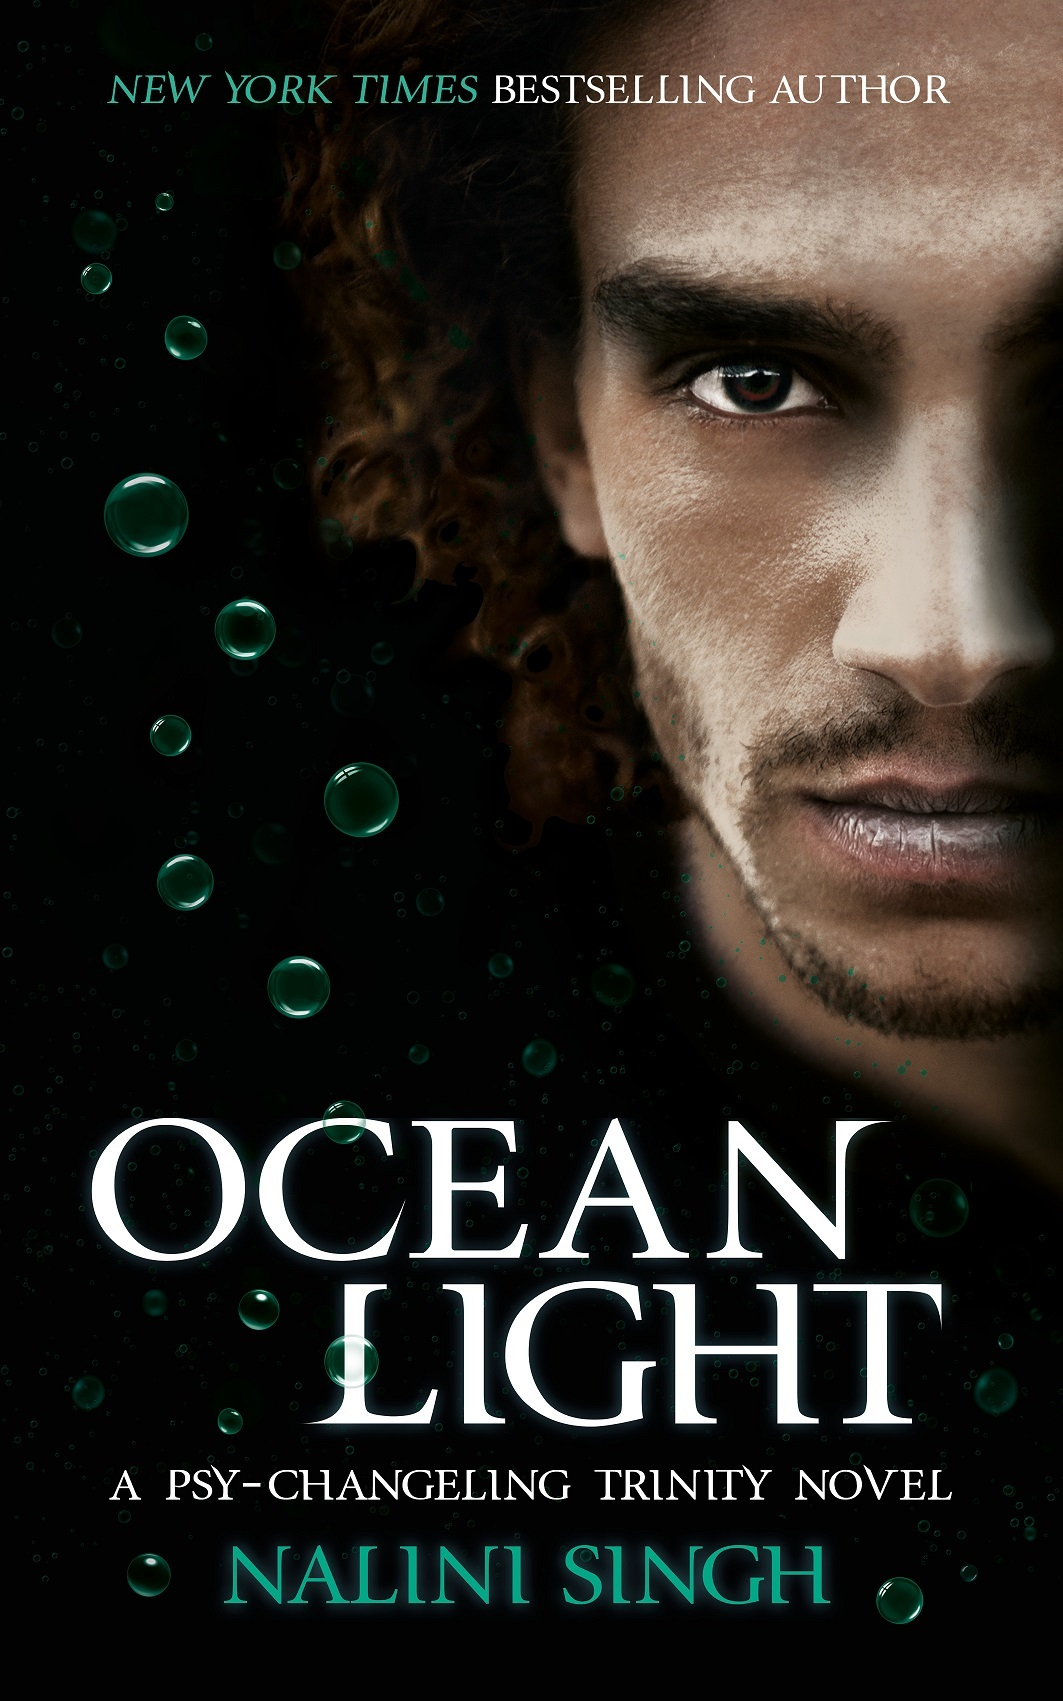 Ocean Light International - Copy - Copy